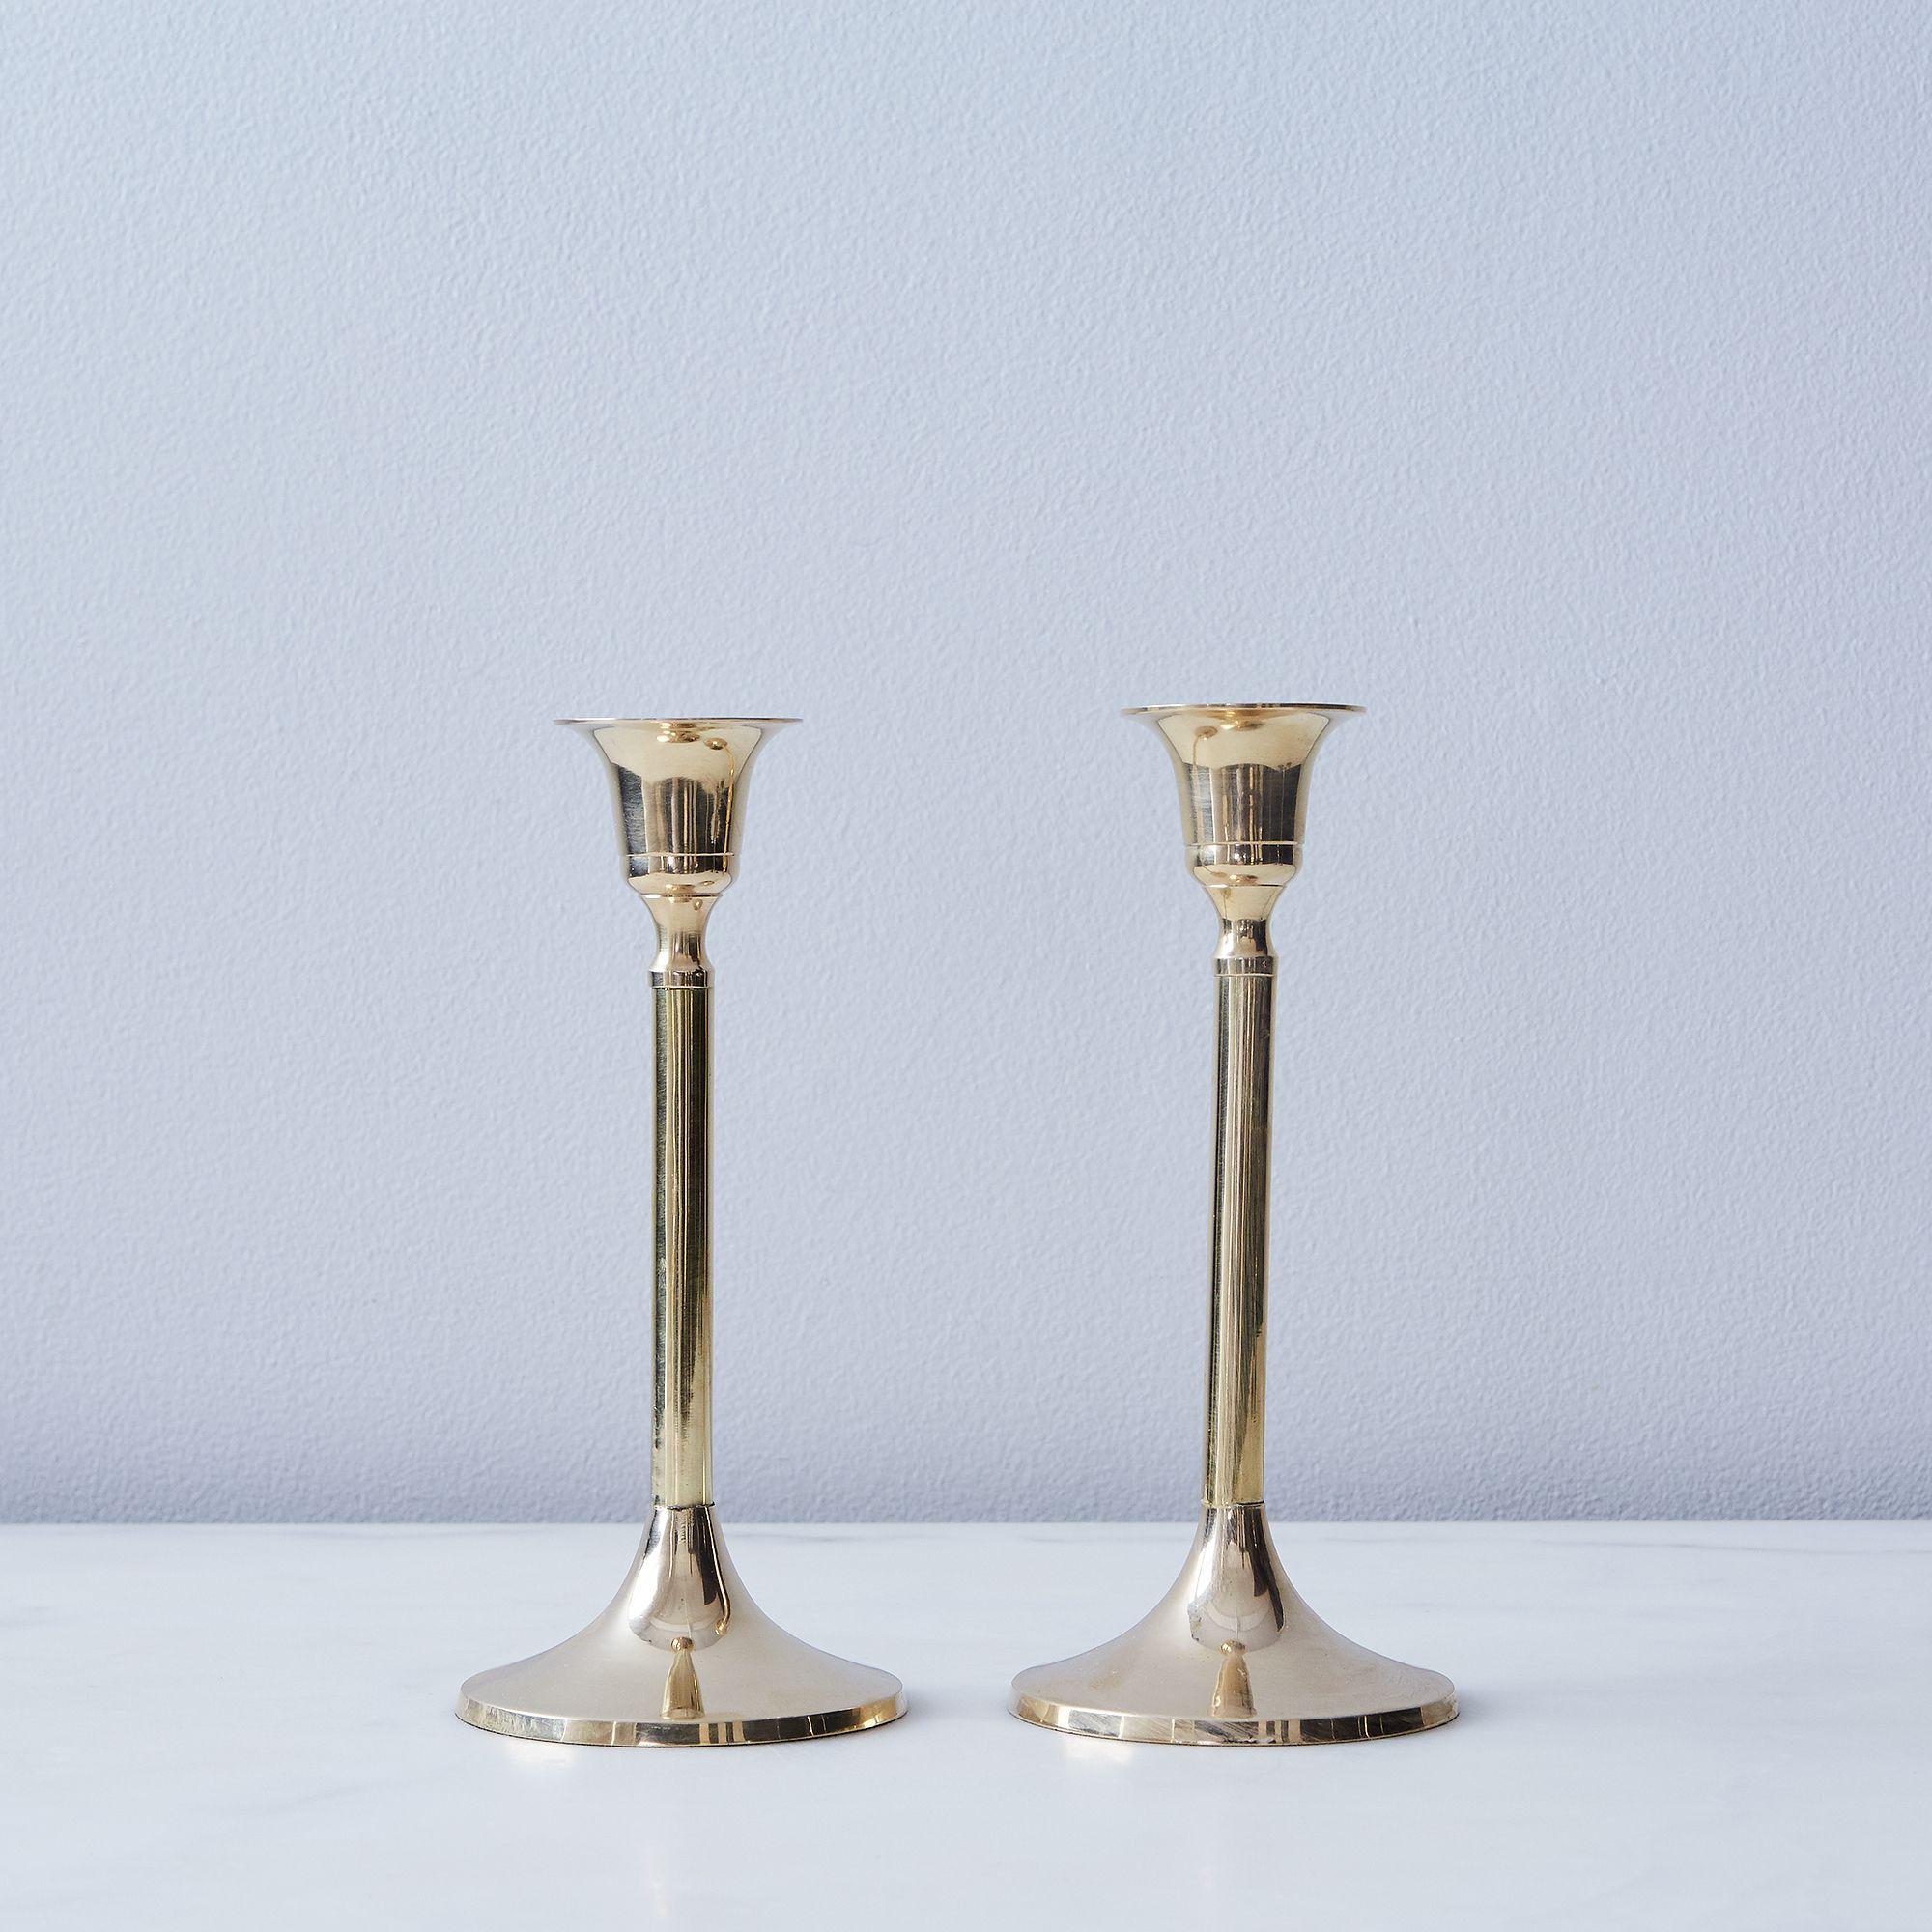 6548333a 7502 4e0d 94bc 5bafee43ef1e  2016 1006 hawkins ny candlestick holders shiny brass set of 2 silo linda xiao 283